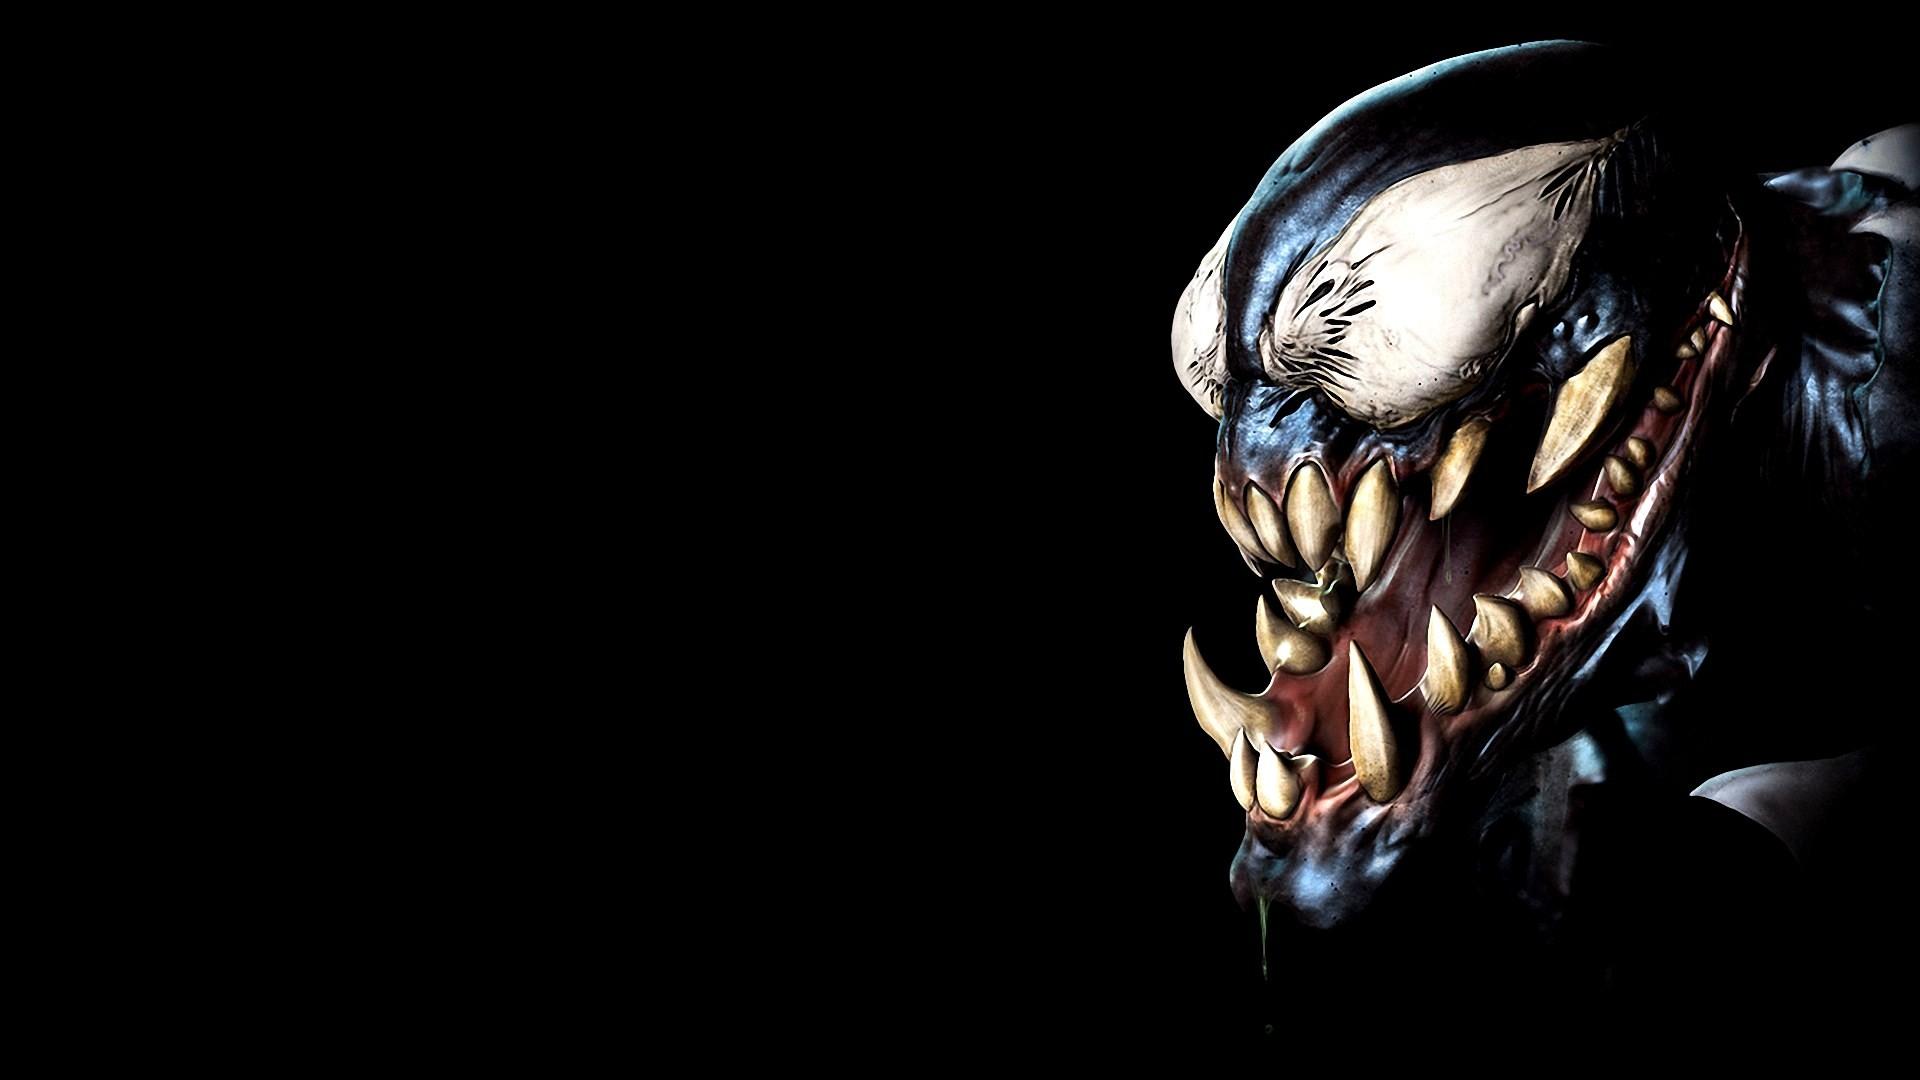 Spider-Man villains images <b>Venom wallpaper and</b> background